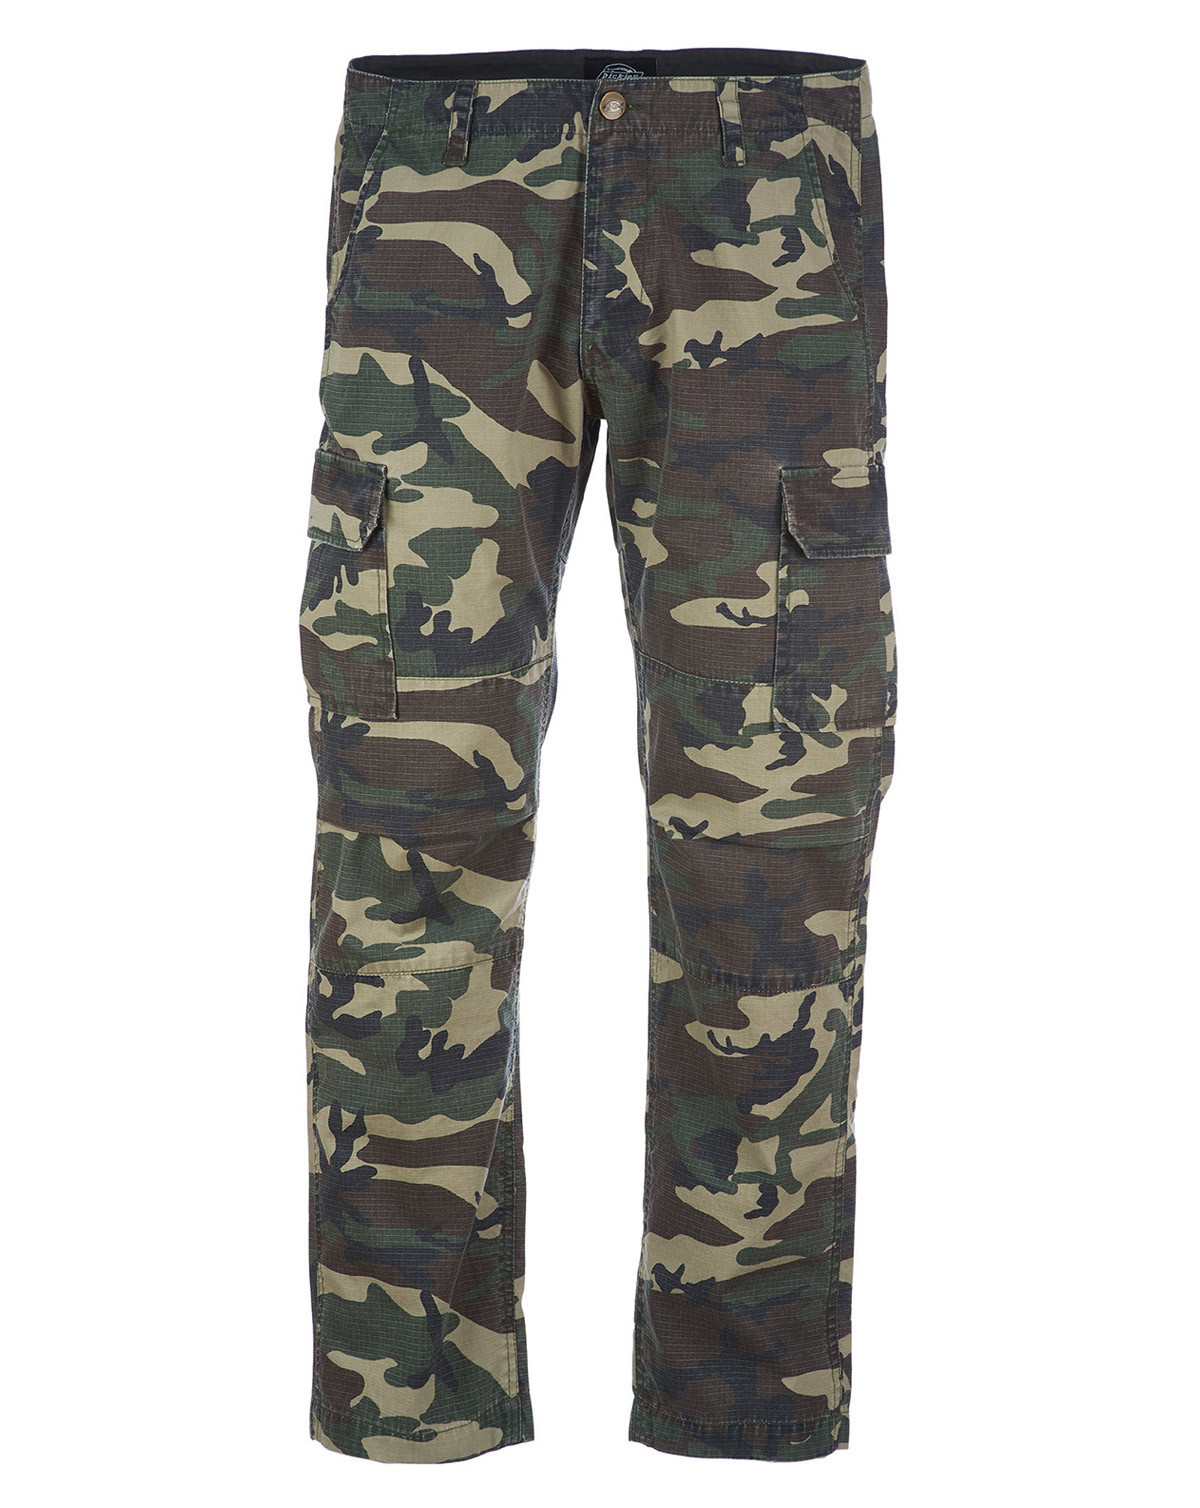 Yorki Camo Cargo Pants